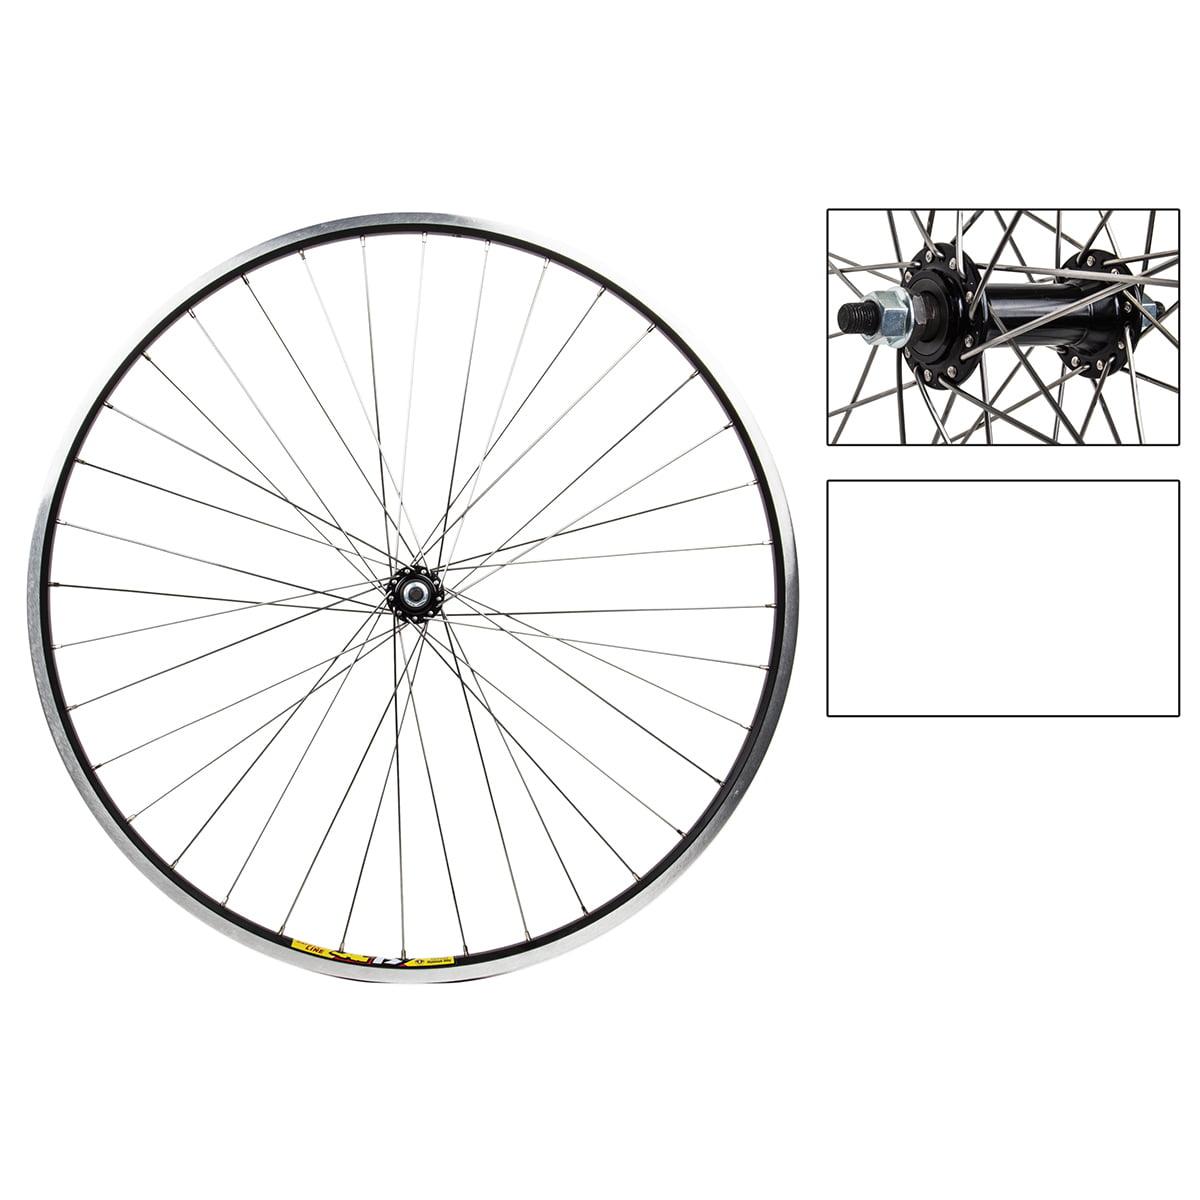 Wheel Front 26x1.5 Weinmann ZAC19 Black 36 Alloy 6B DISC Quick Release Black